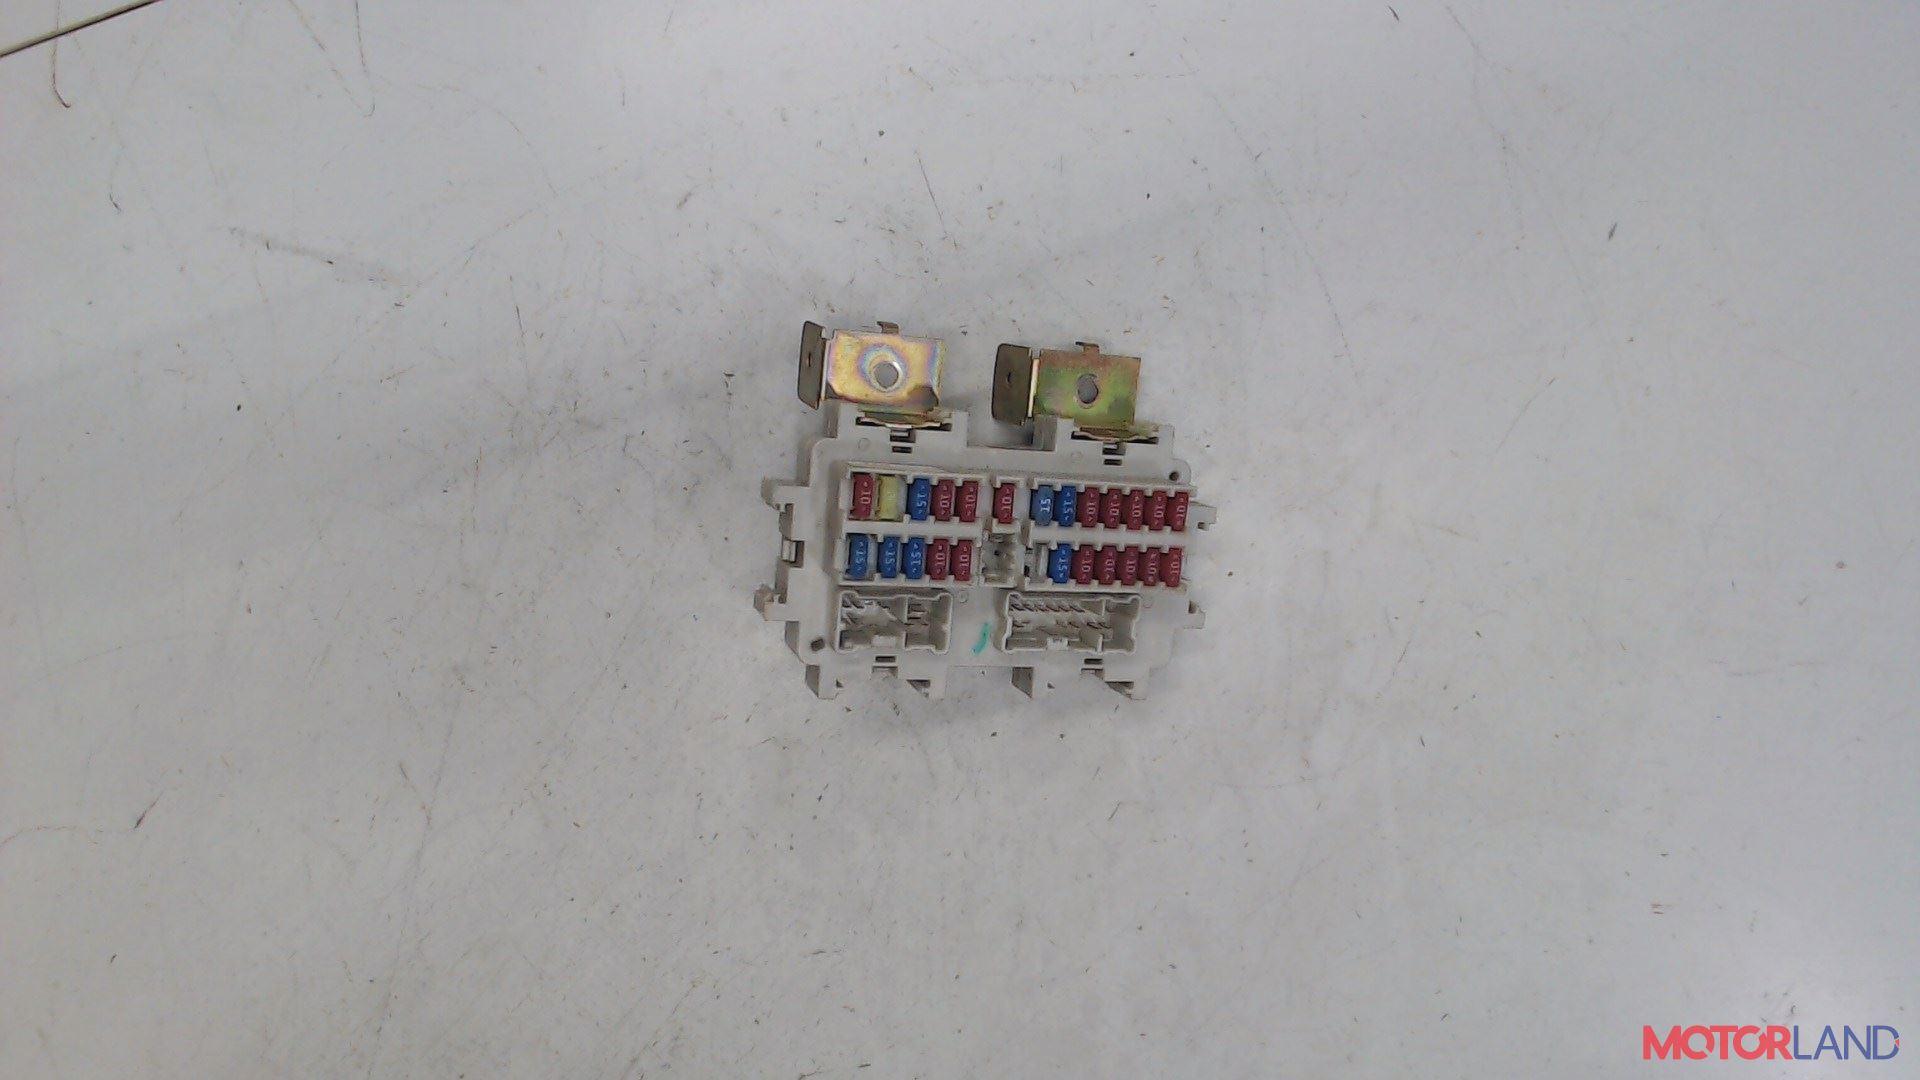 Блок предохранителей Infiniti QX56 (JA60) 2004-2010, [КонстрНомер-Артикул] #1